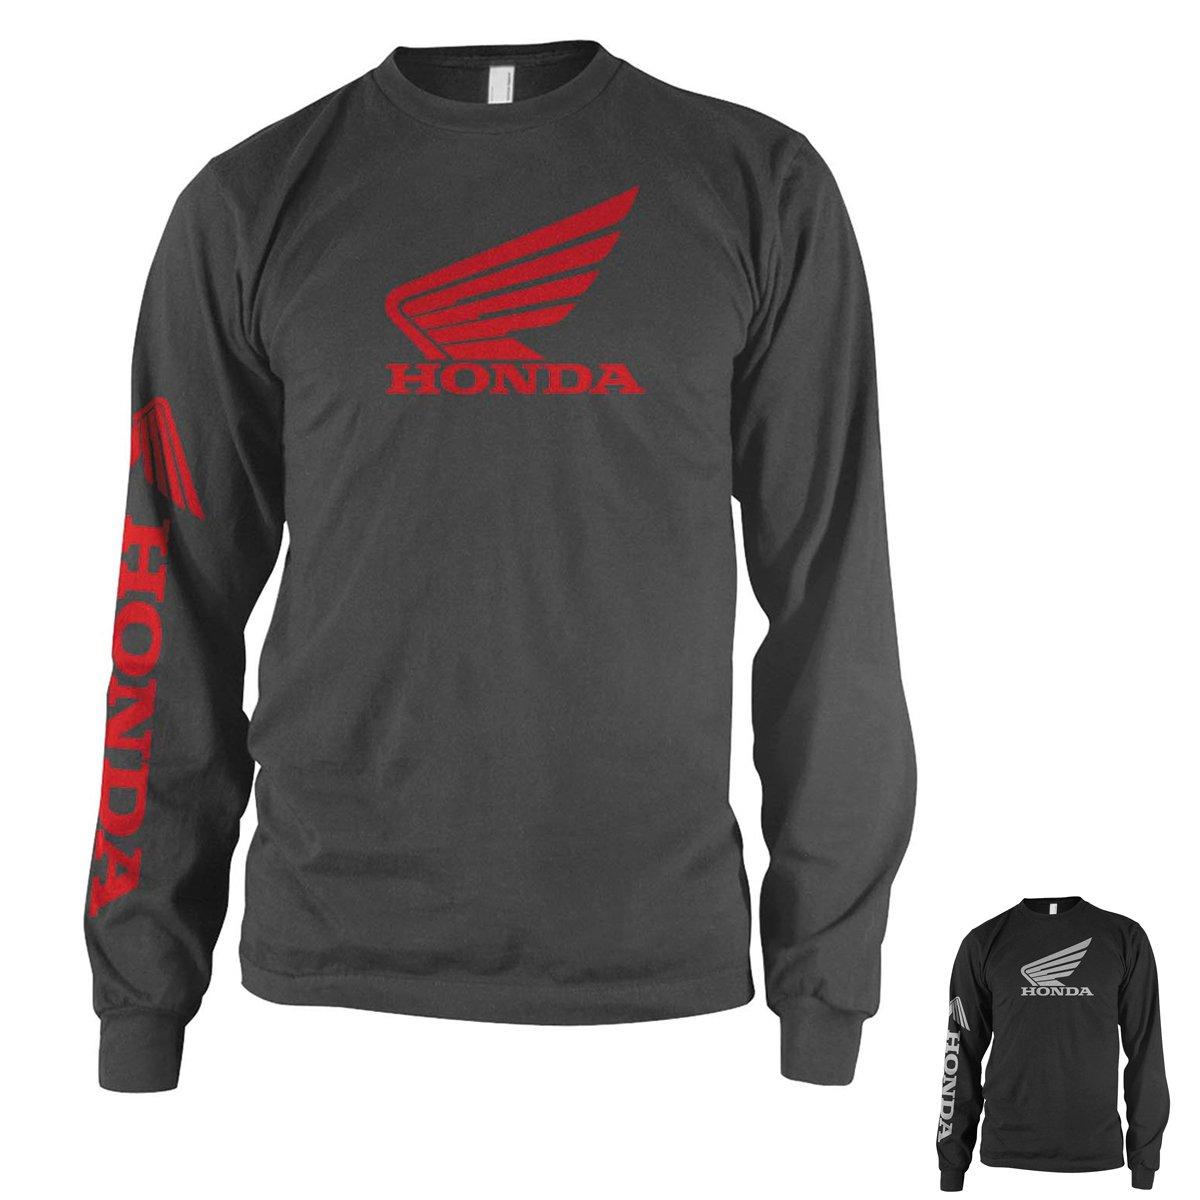 Black t shirt long sleeve - Black T Shirt Long Sleeve 33